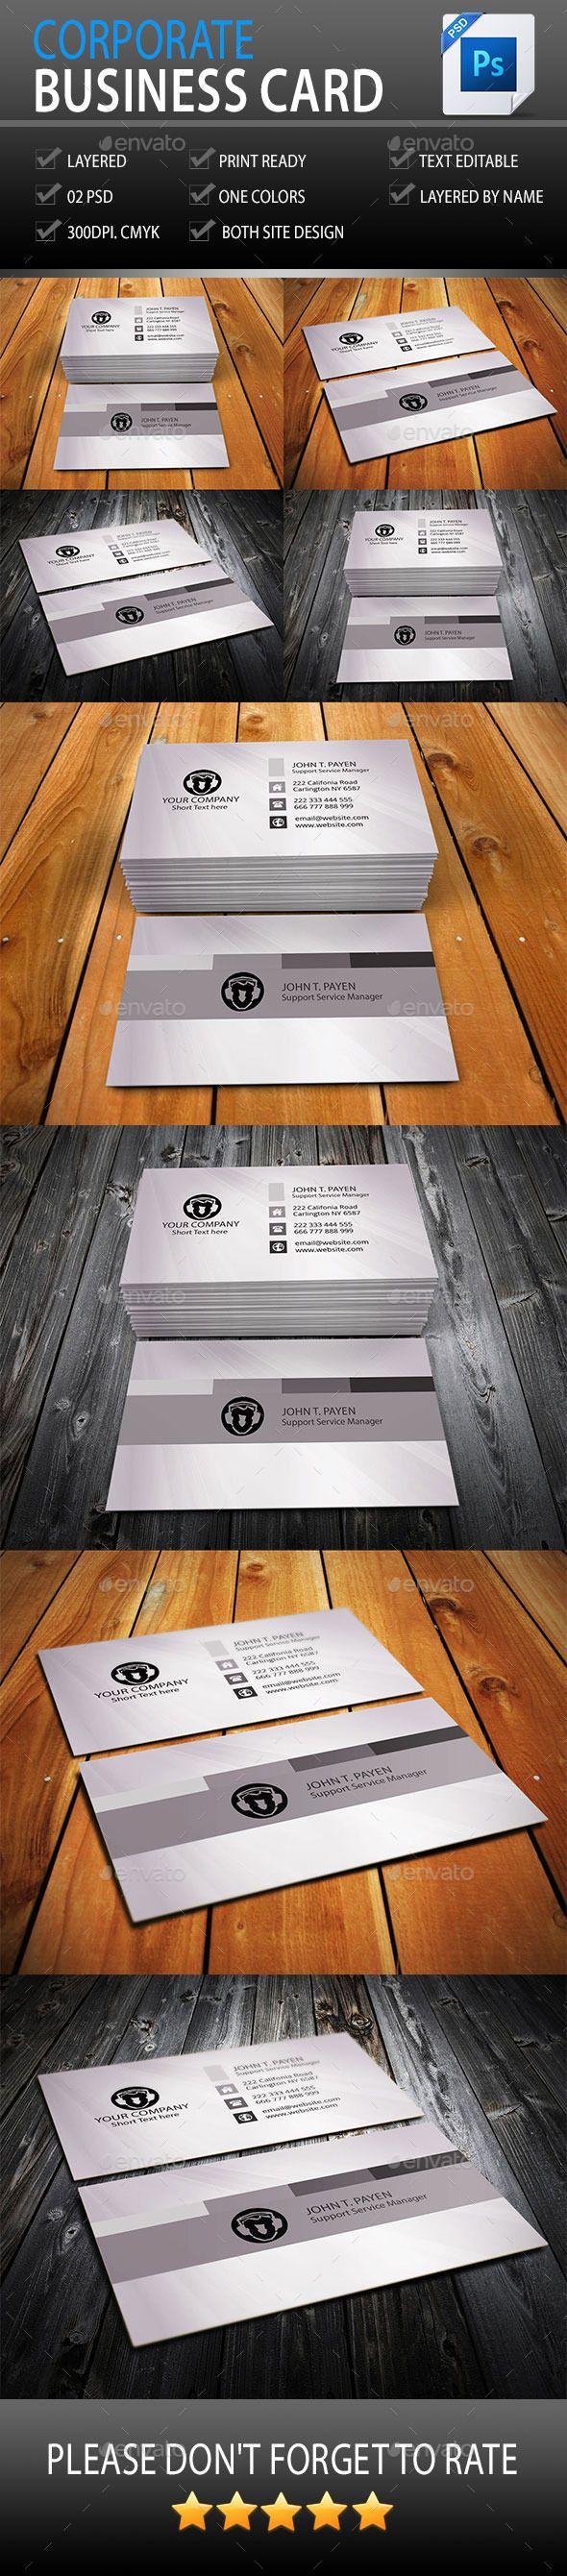 Corporate Business Card Vol: 04